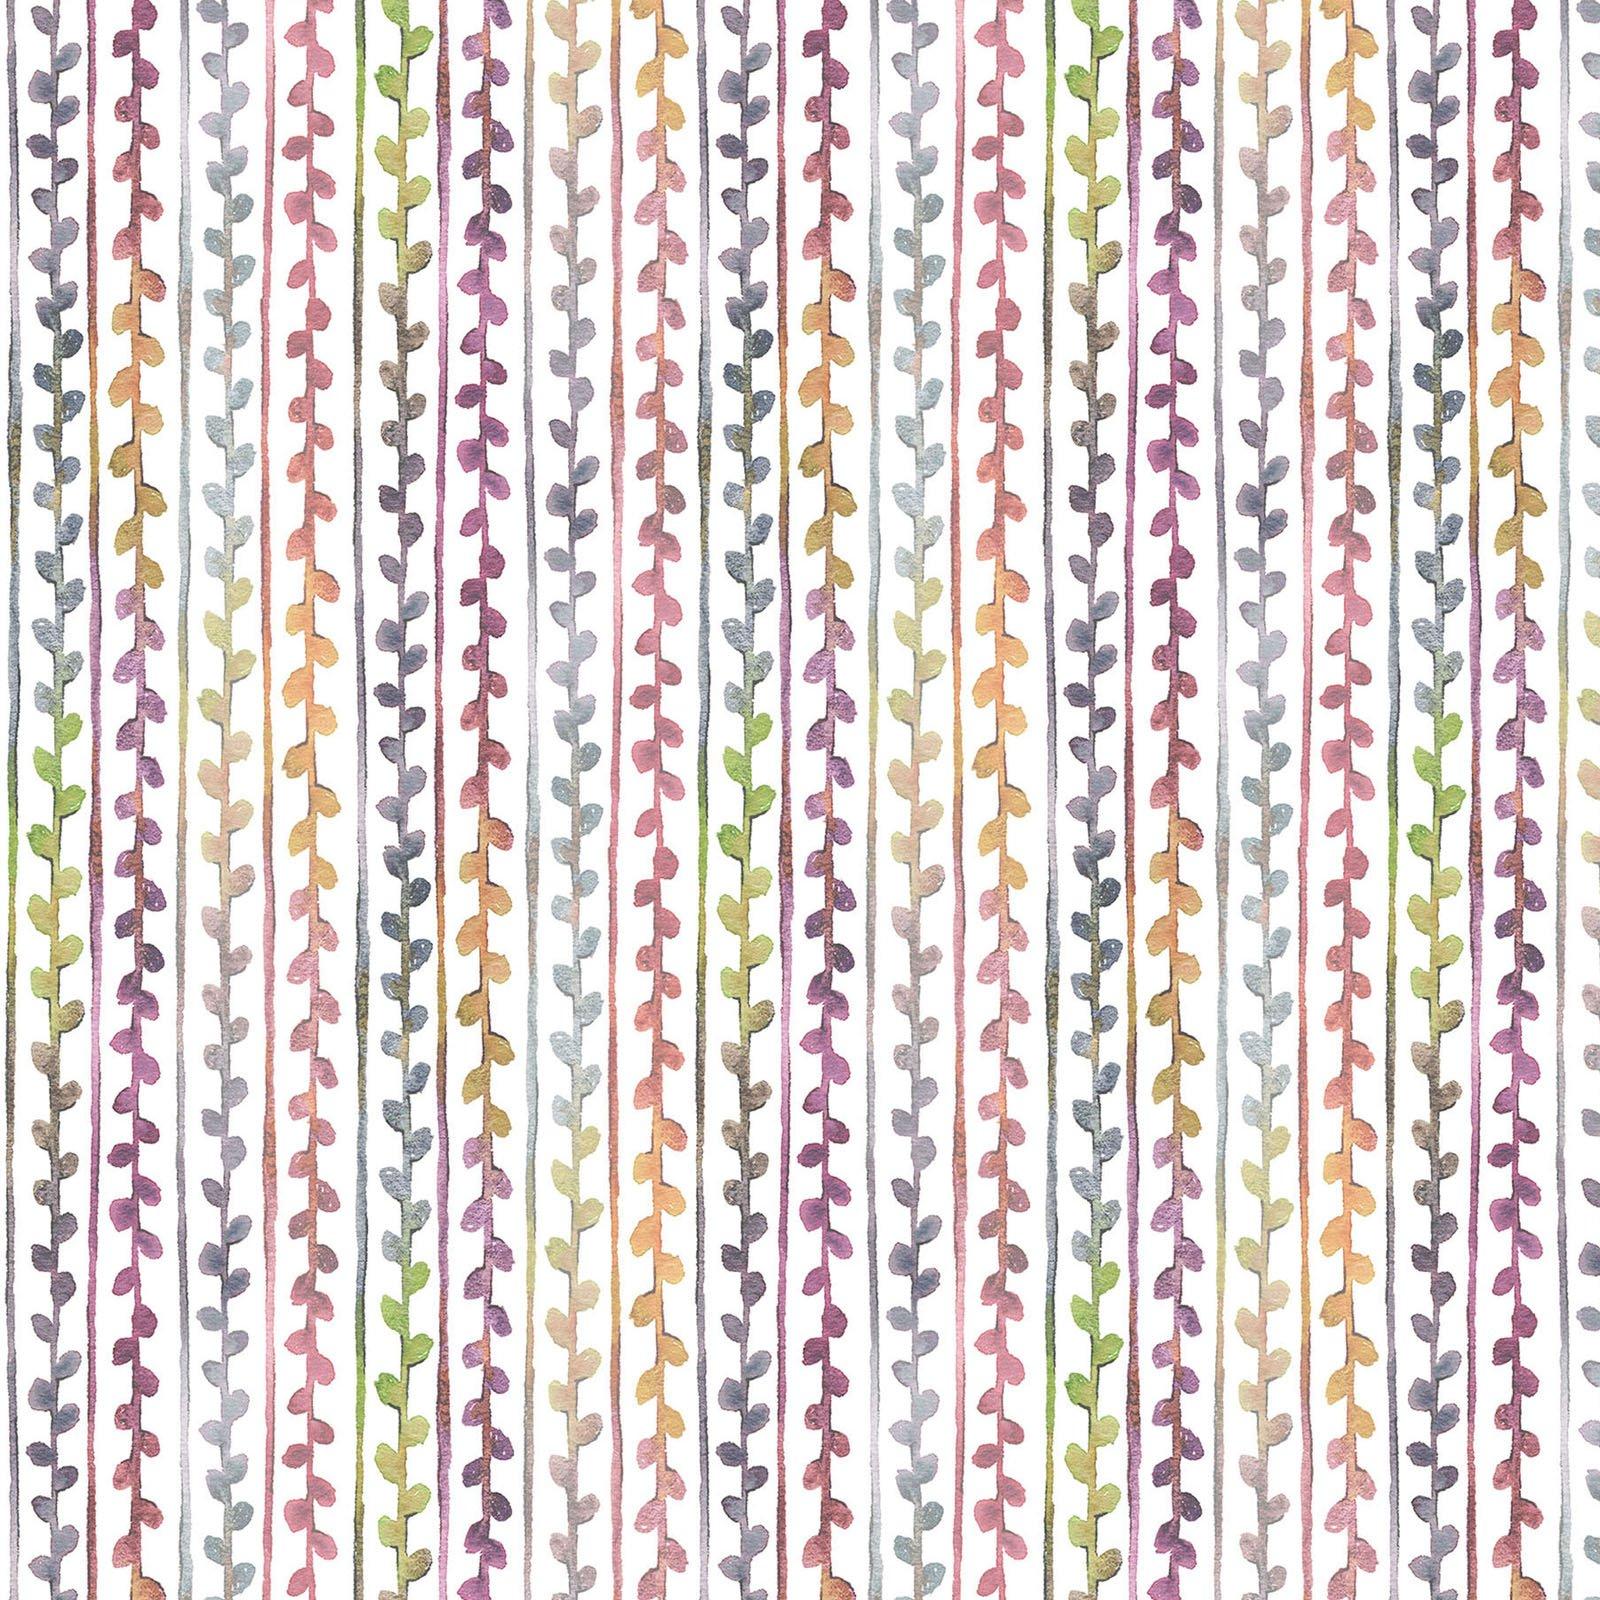 LIDW-4345 MU - LITTLE DARLINGS WOODLAND BY SILLIER THAN SALLY SMALL STRIPE MULTI